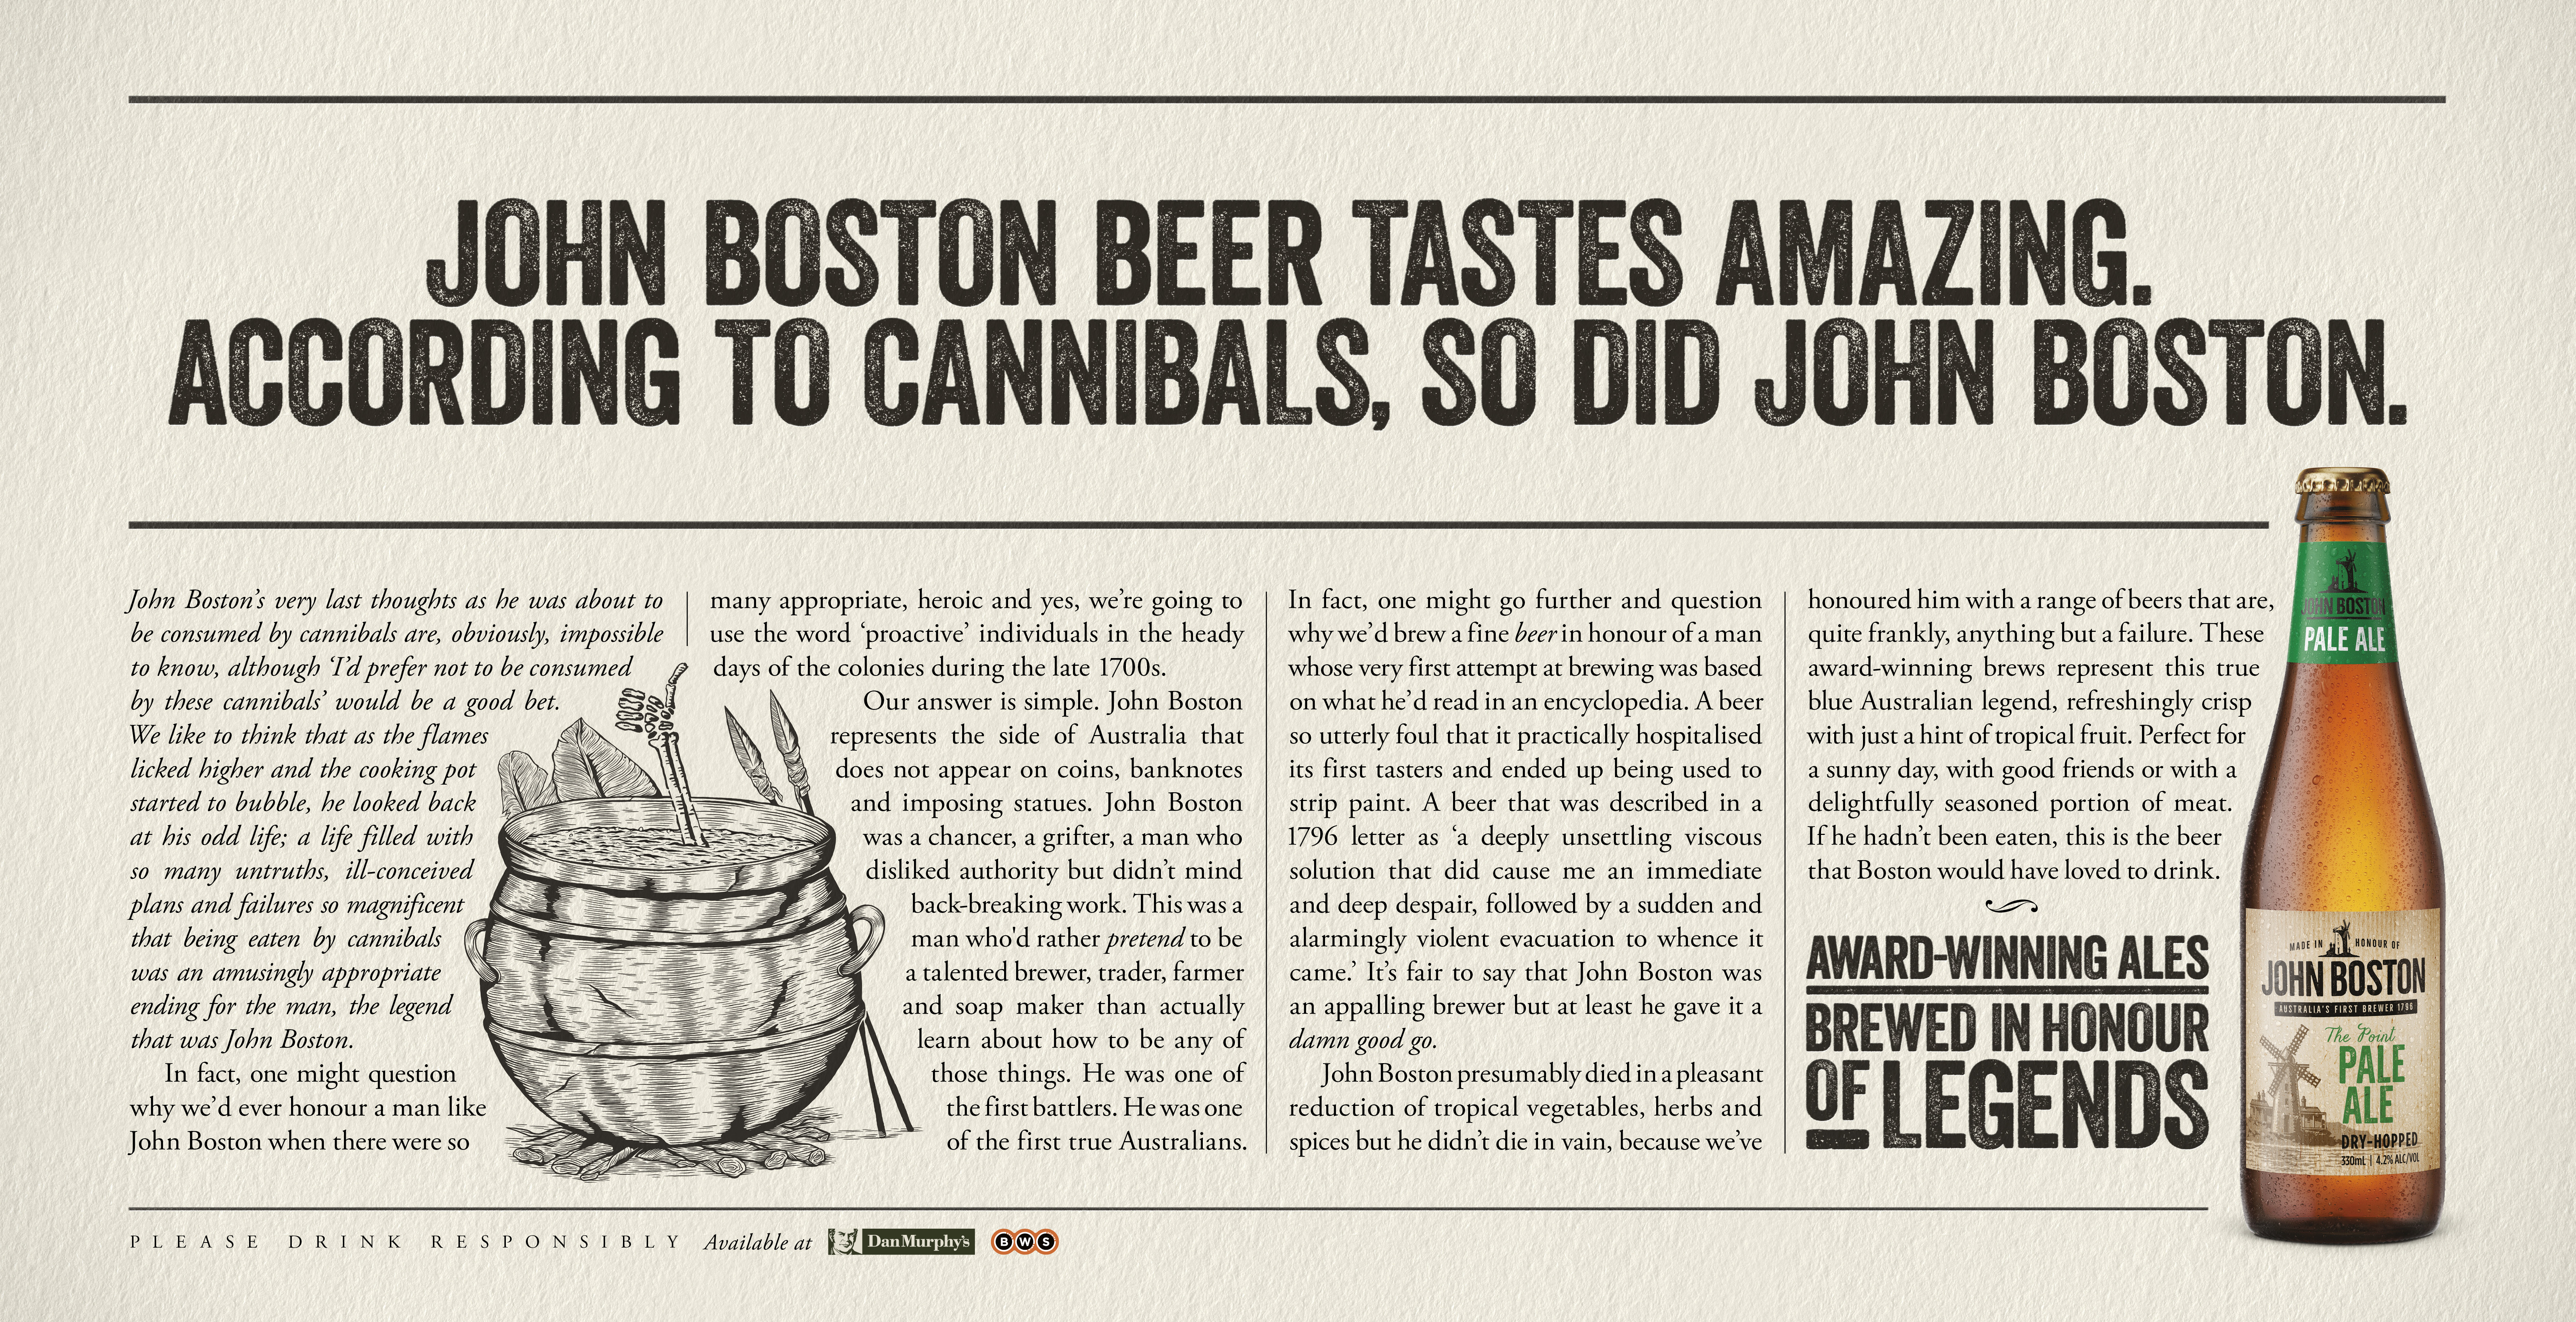 John Boston beer tastes amazing. According to cannibals, so did John Boston.